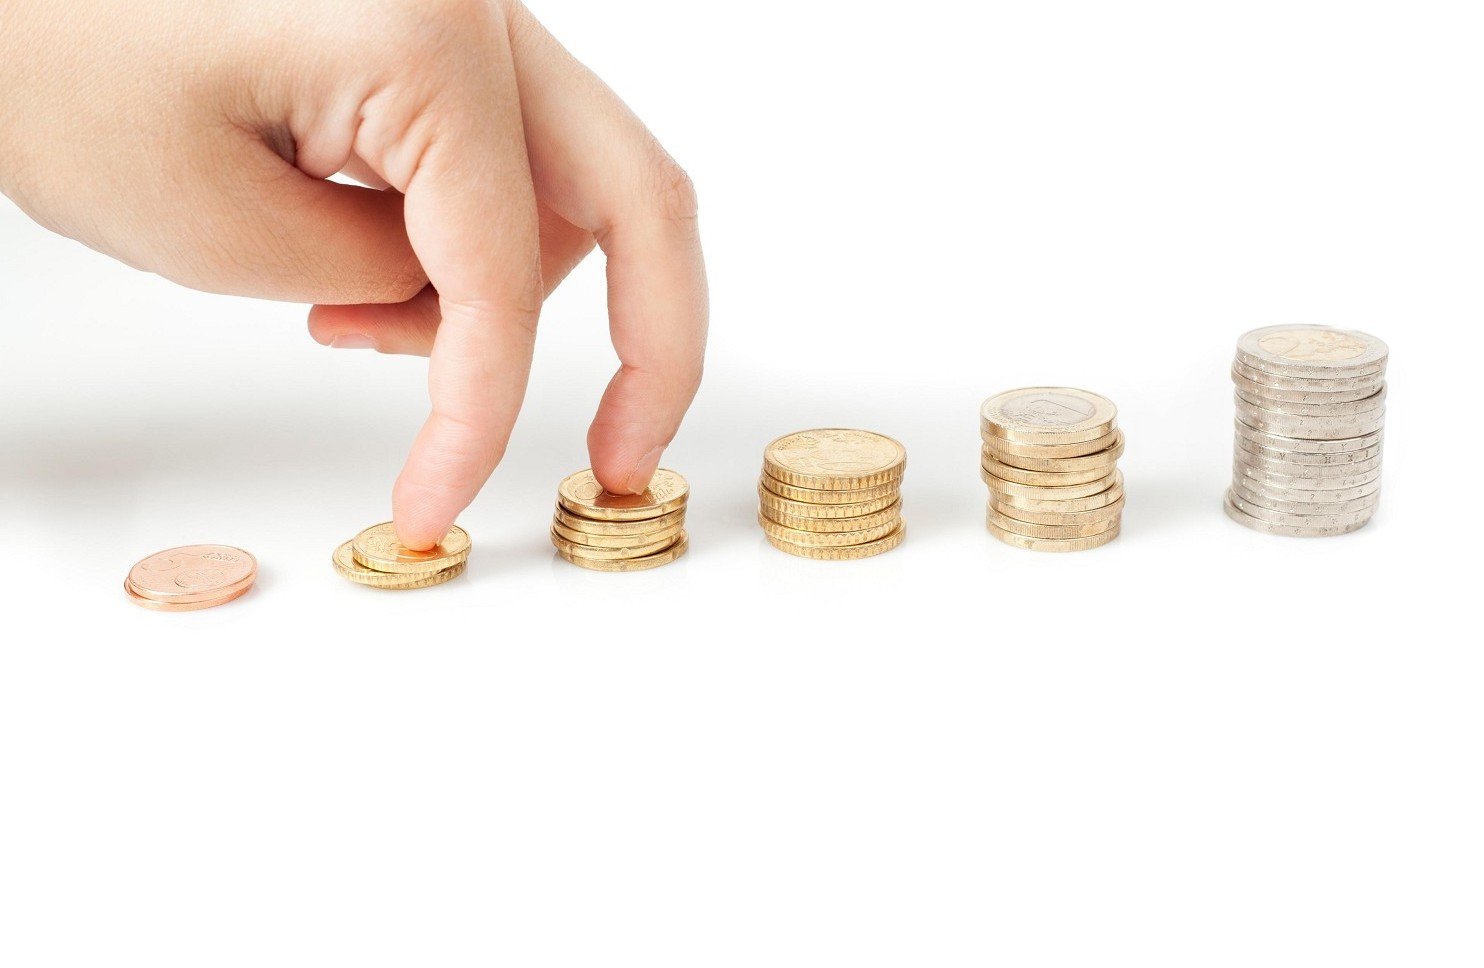 Pensioni Quota 100 fondamentale sistema